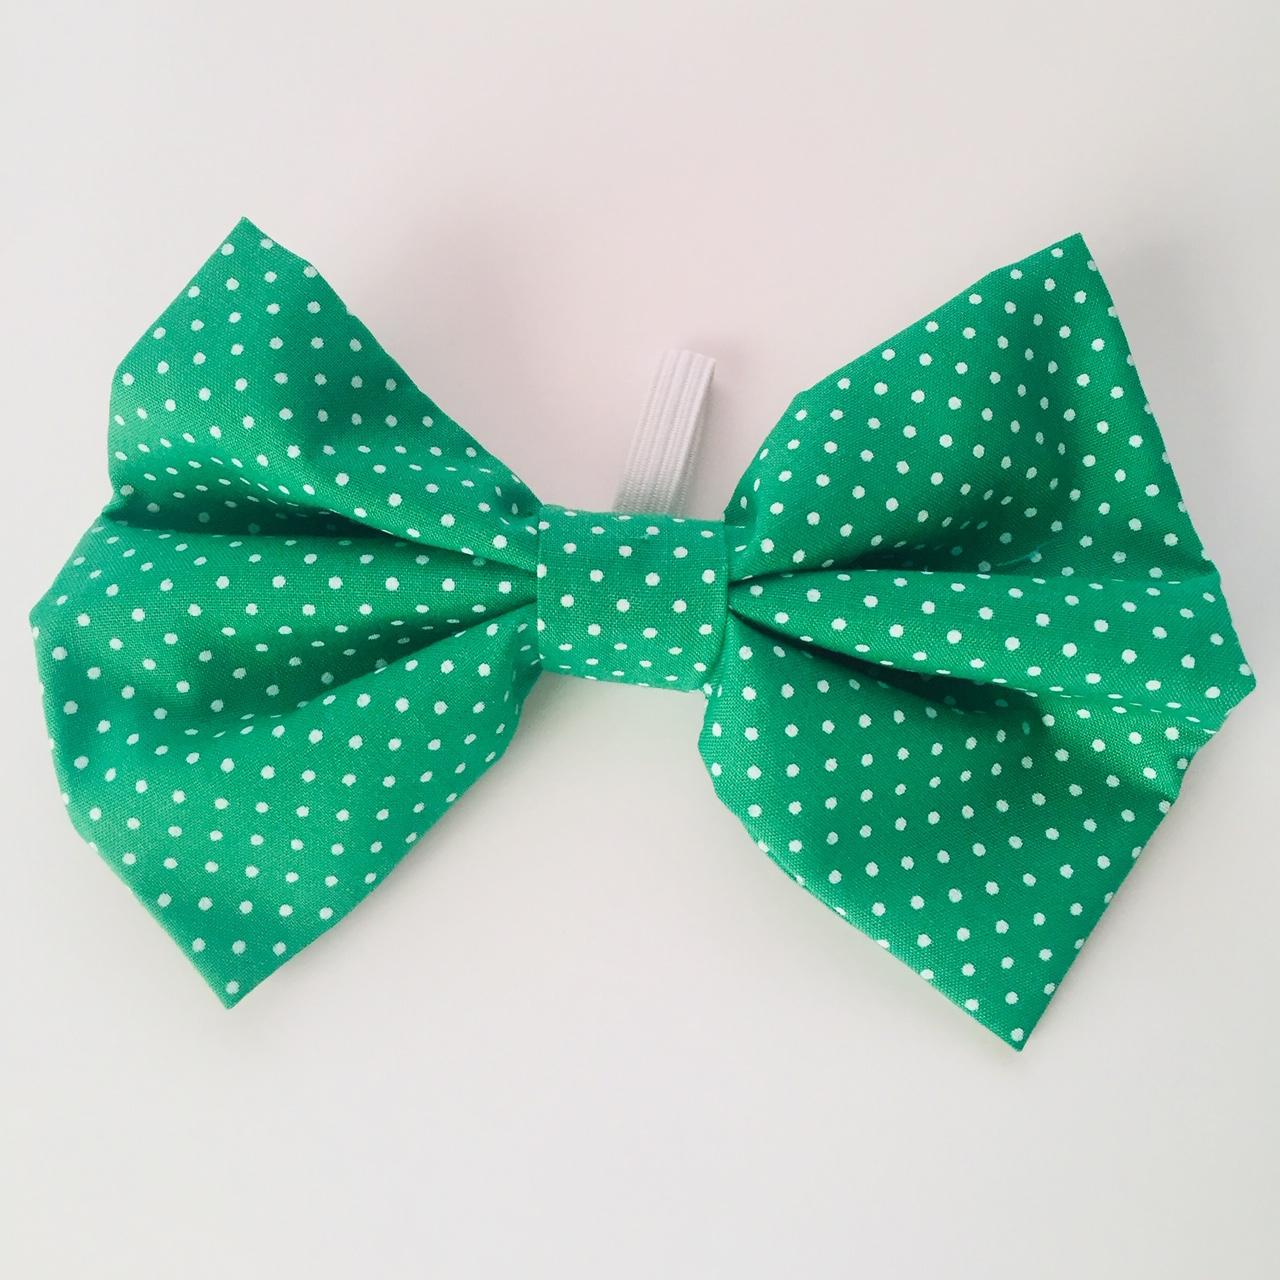 Corbatín Verde puntos blancos (talla M agotada)